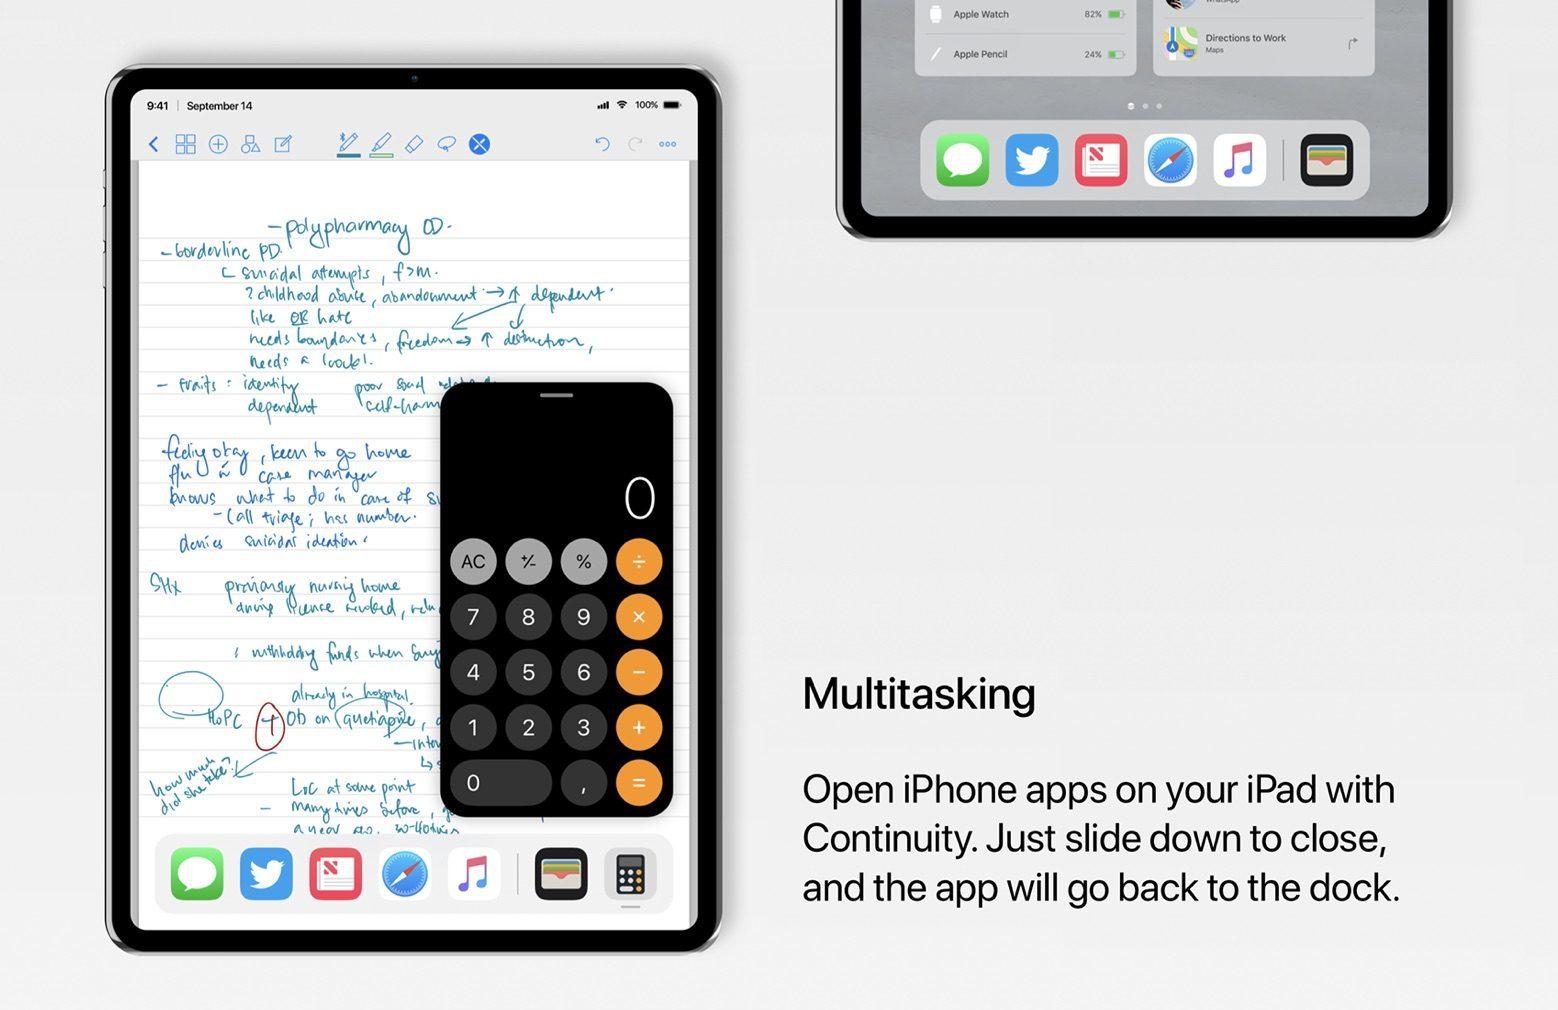 iPad Pro ทำงานแบบ Multitasking